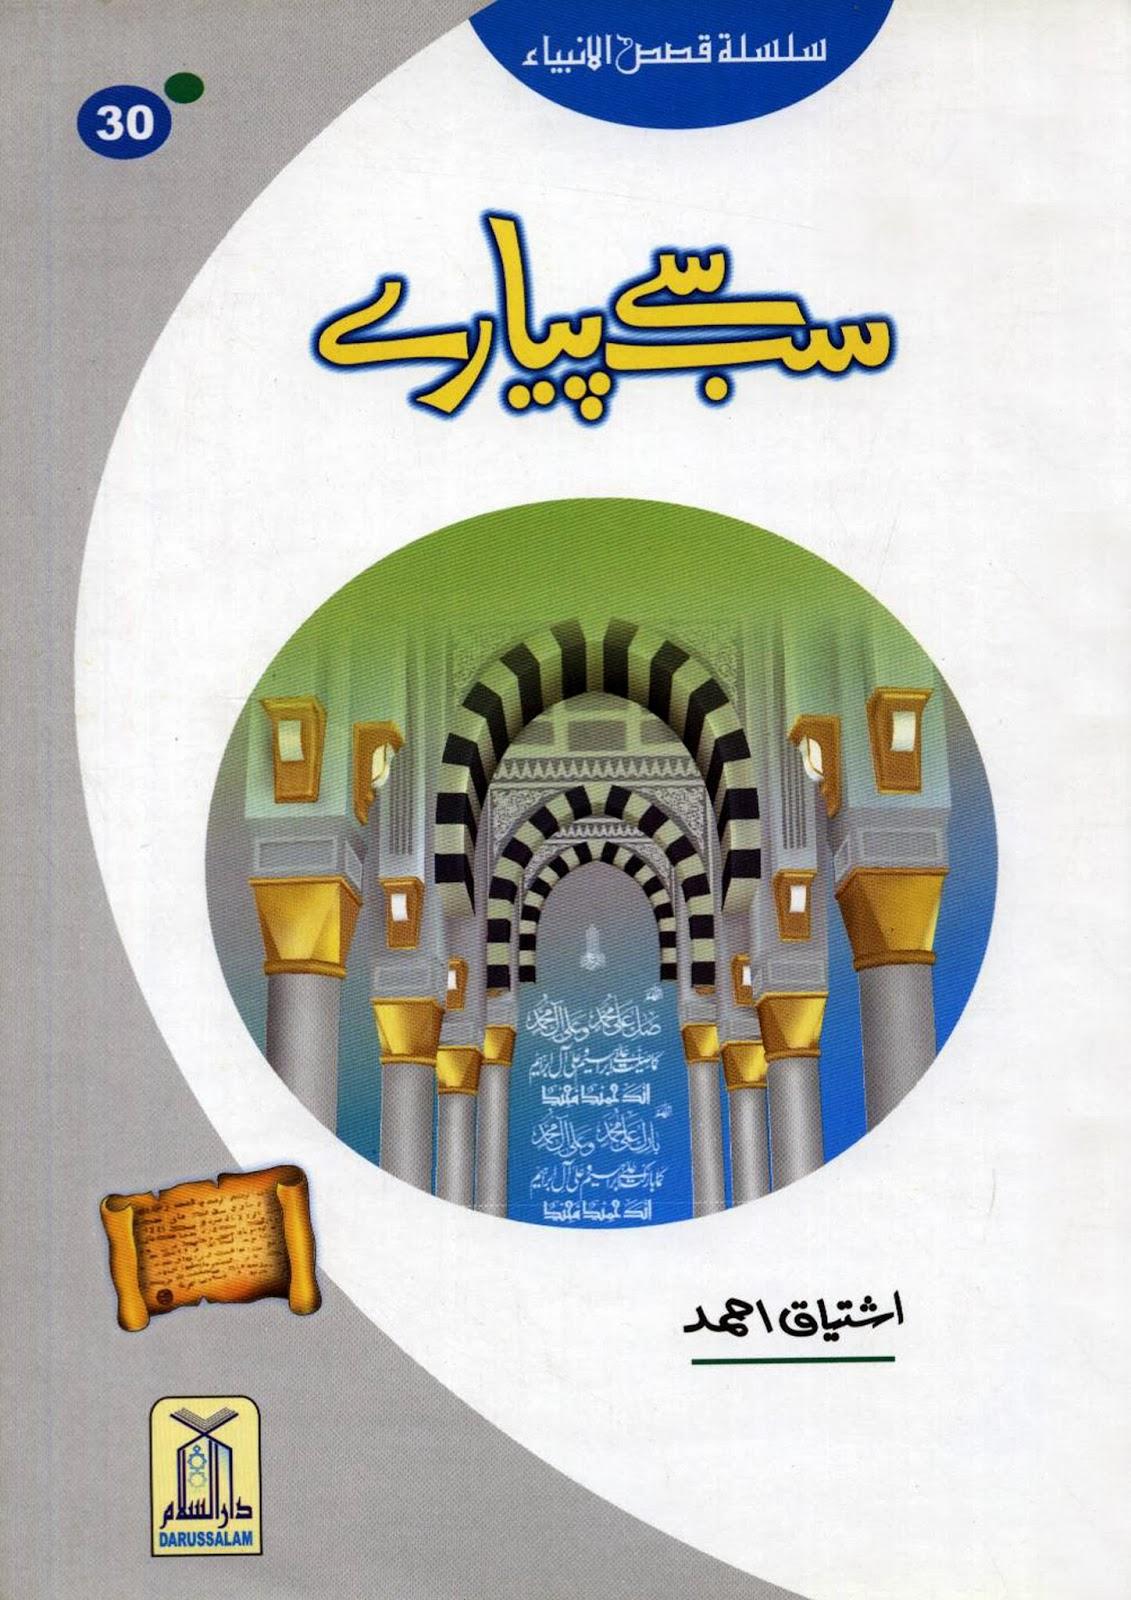 http://urduguru1.blogspot.com/2014/03/sab-ssy-peyary-mohammad-saw.html